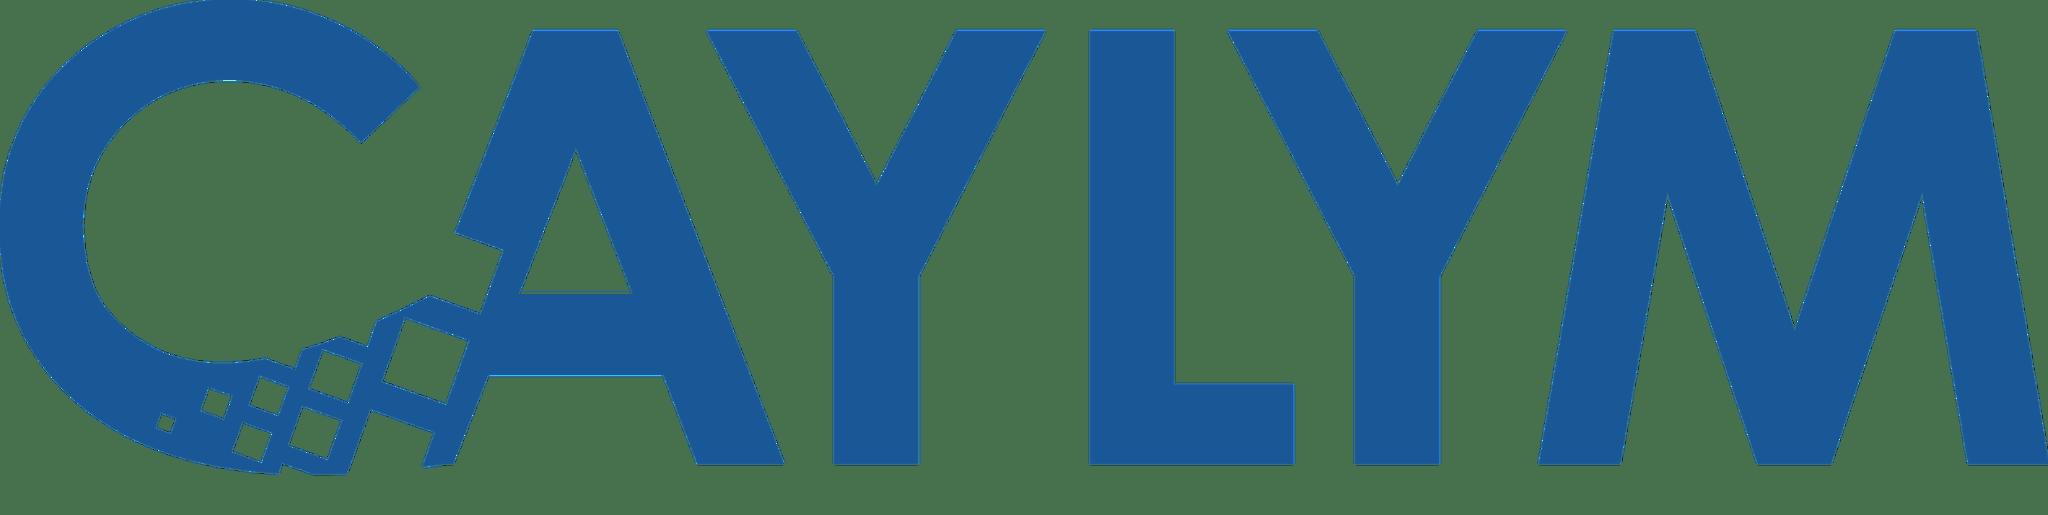 Caylym Technologies International